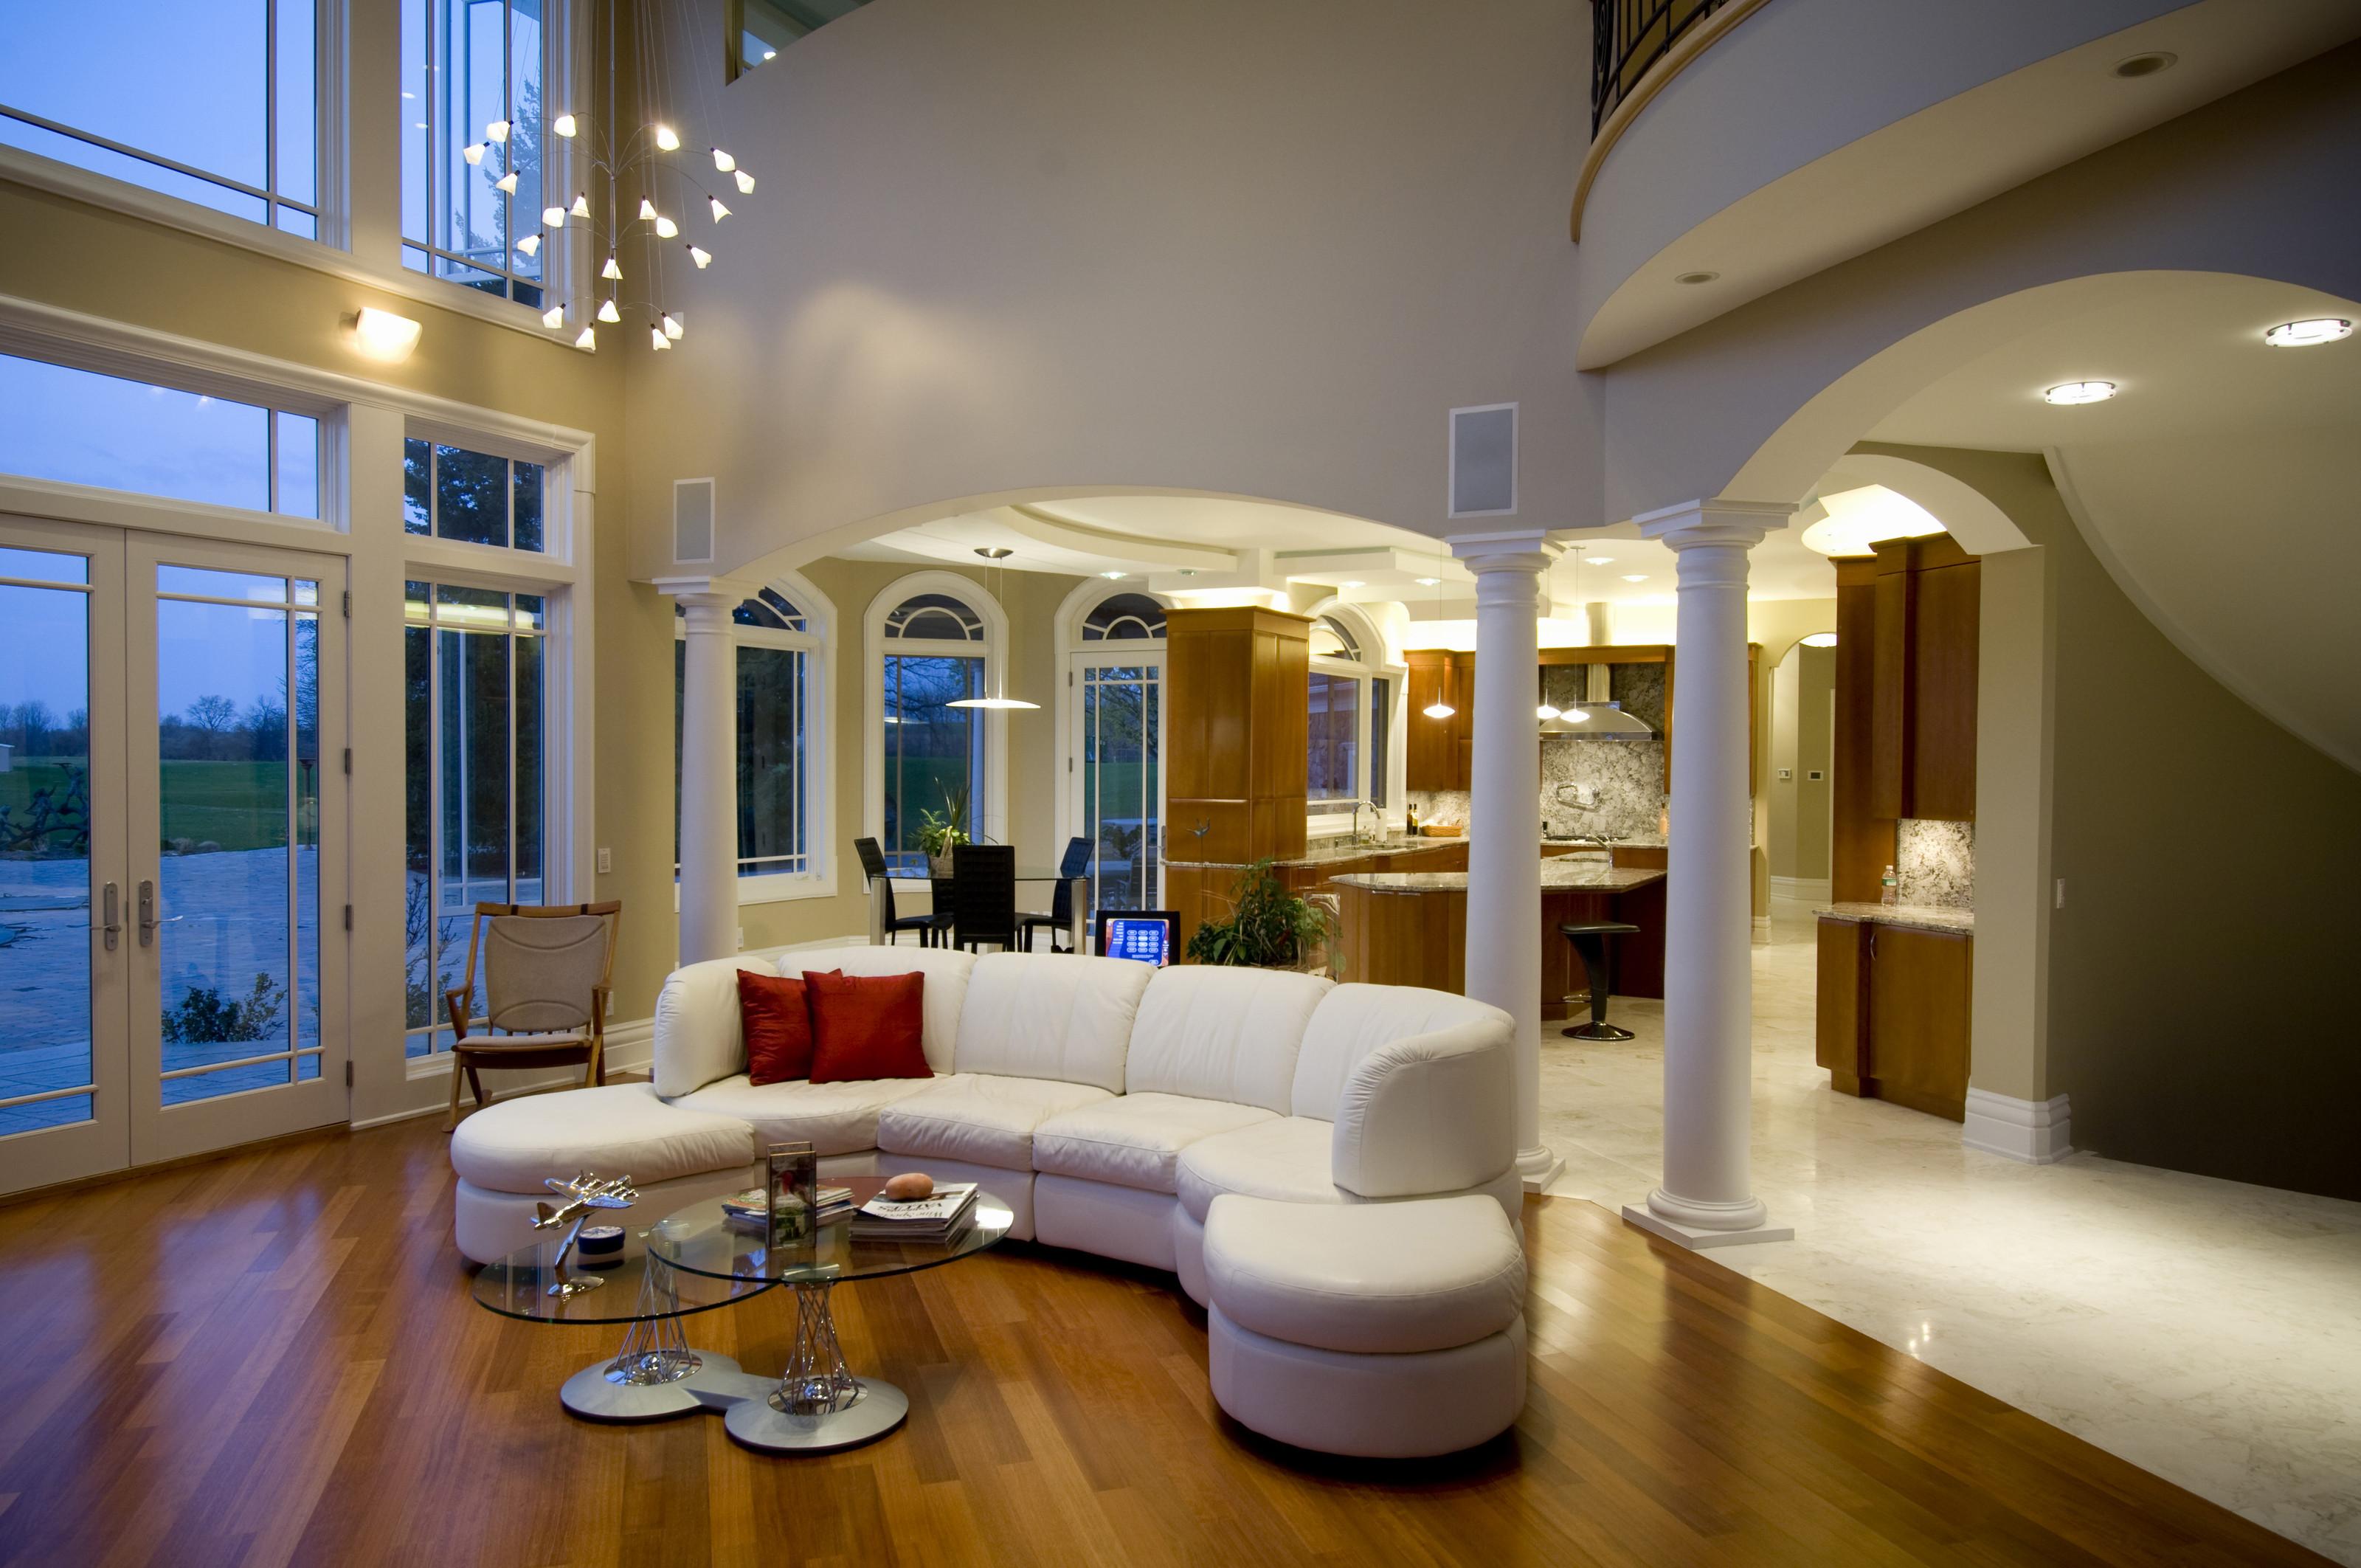 Красота дизайн интерьера